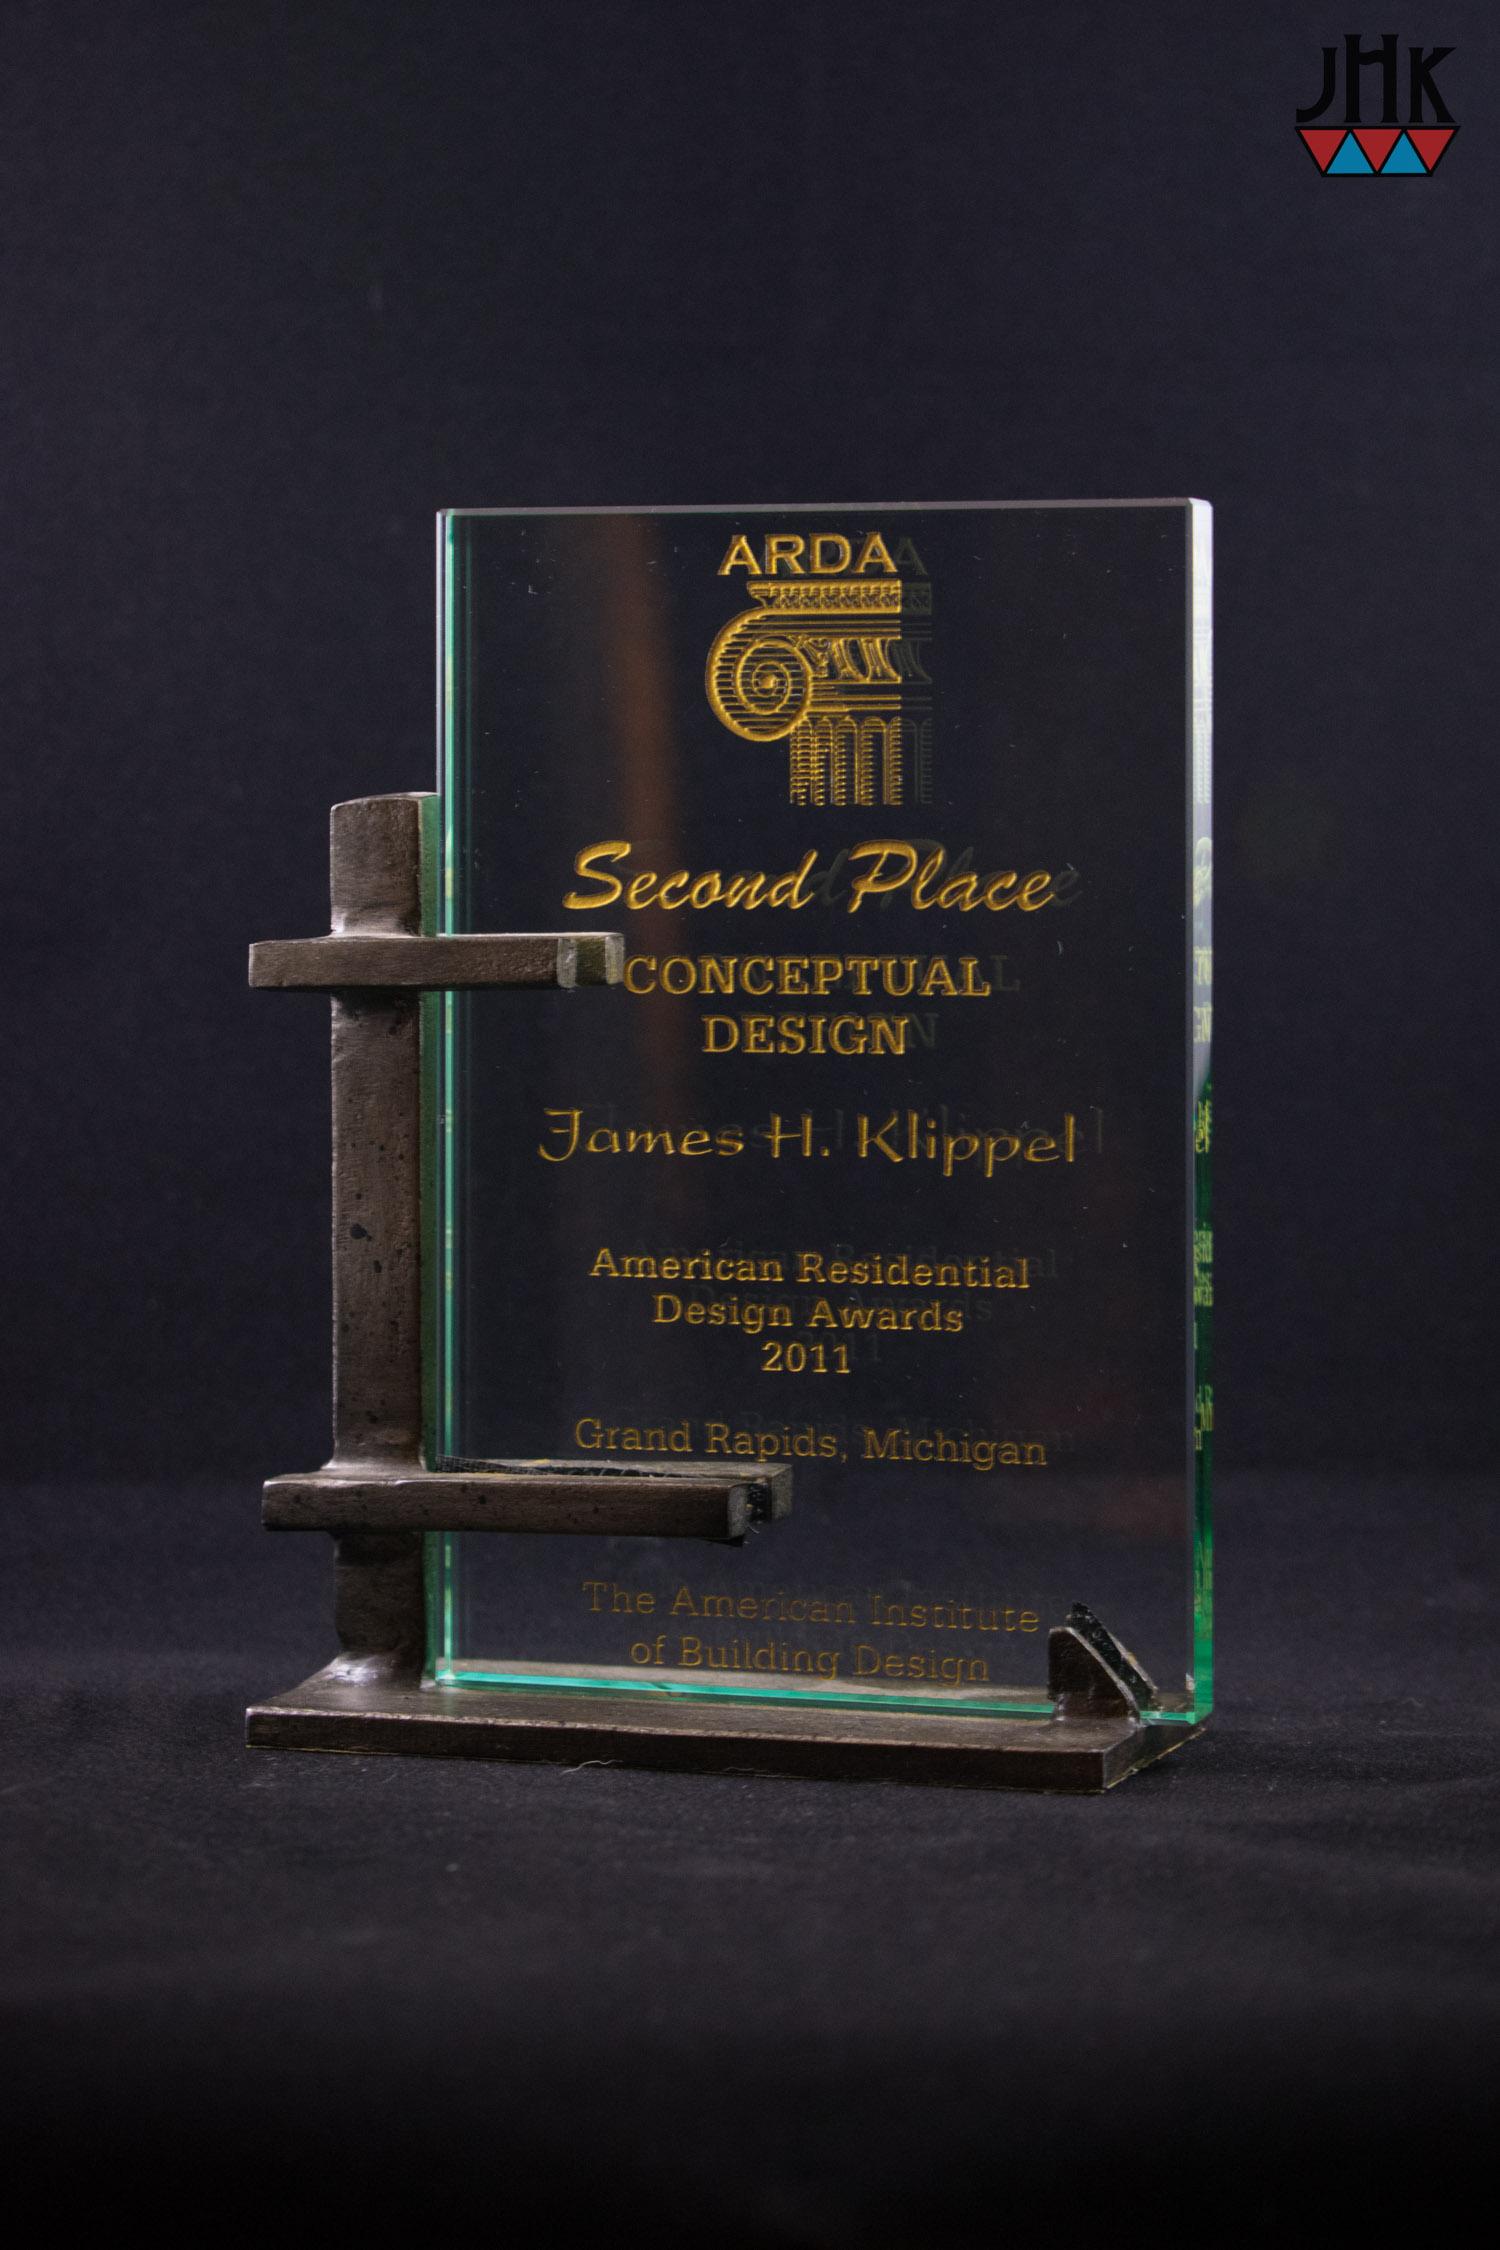 aibd arda award conceptual design grand rapids michigan jim klippel 2011-1.jpg